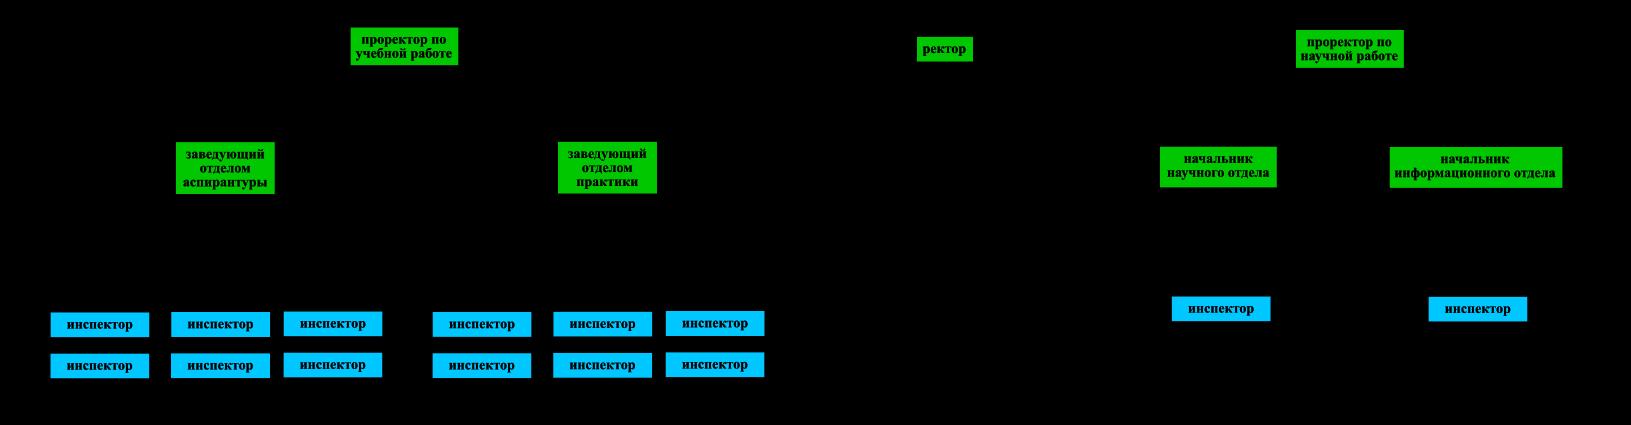 Пример штатного состава ректората